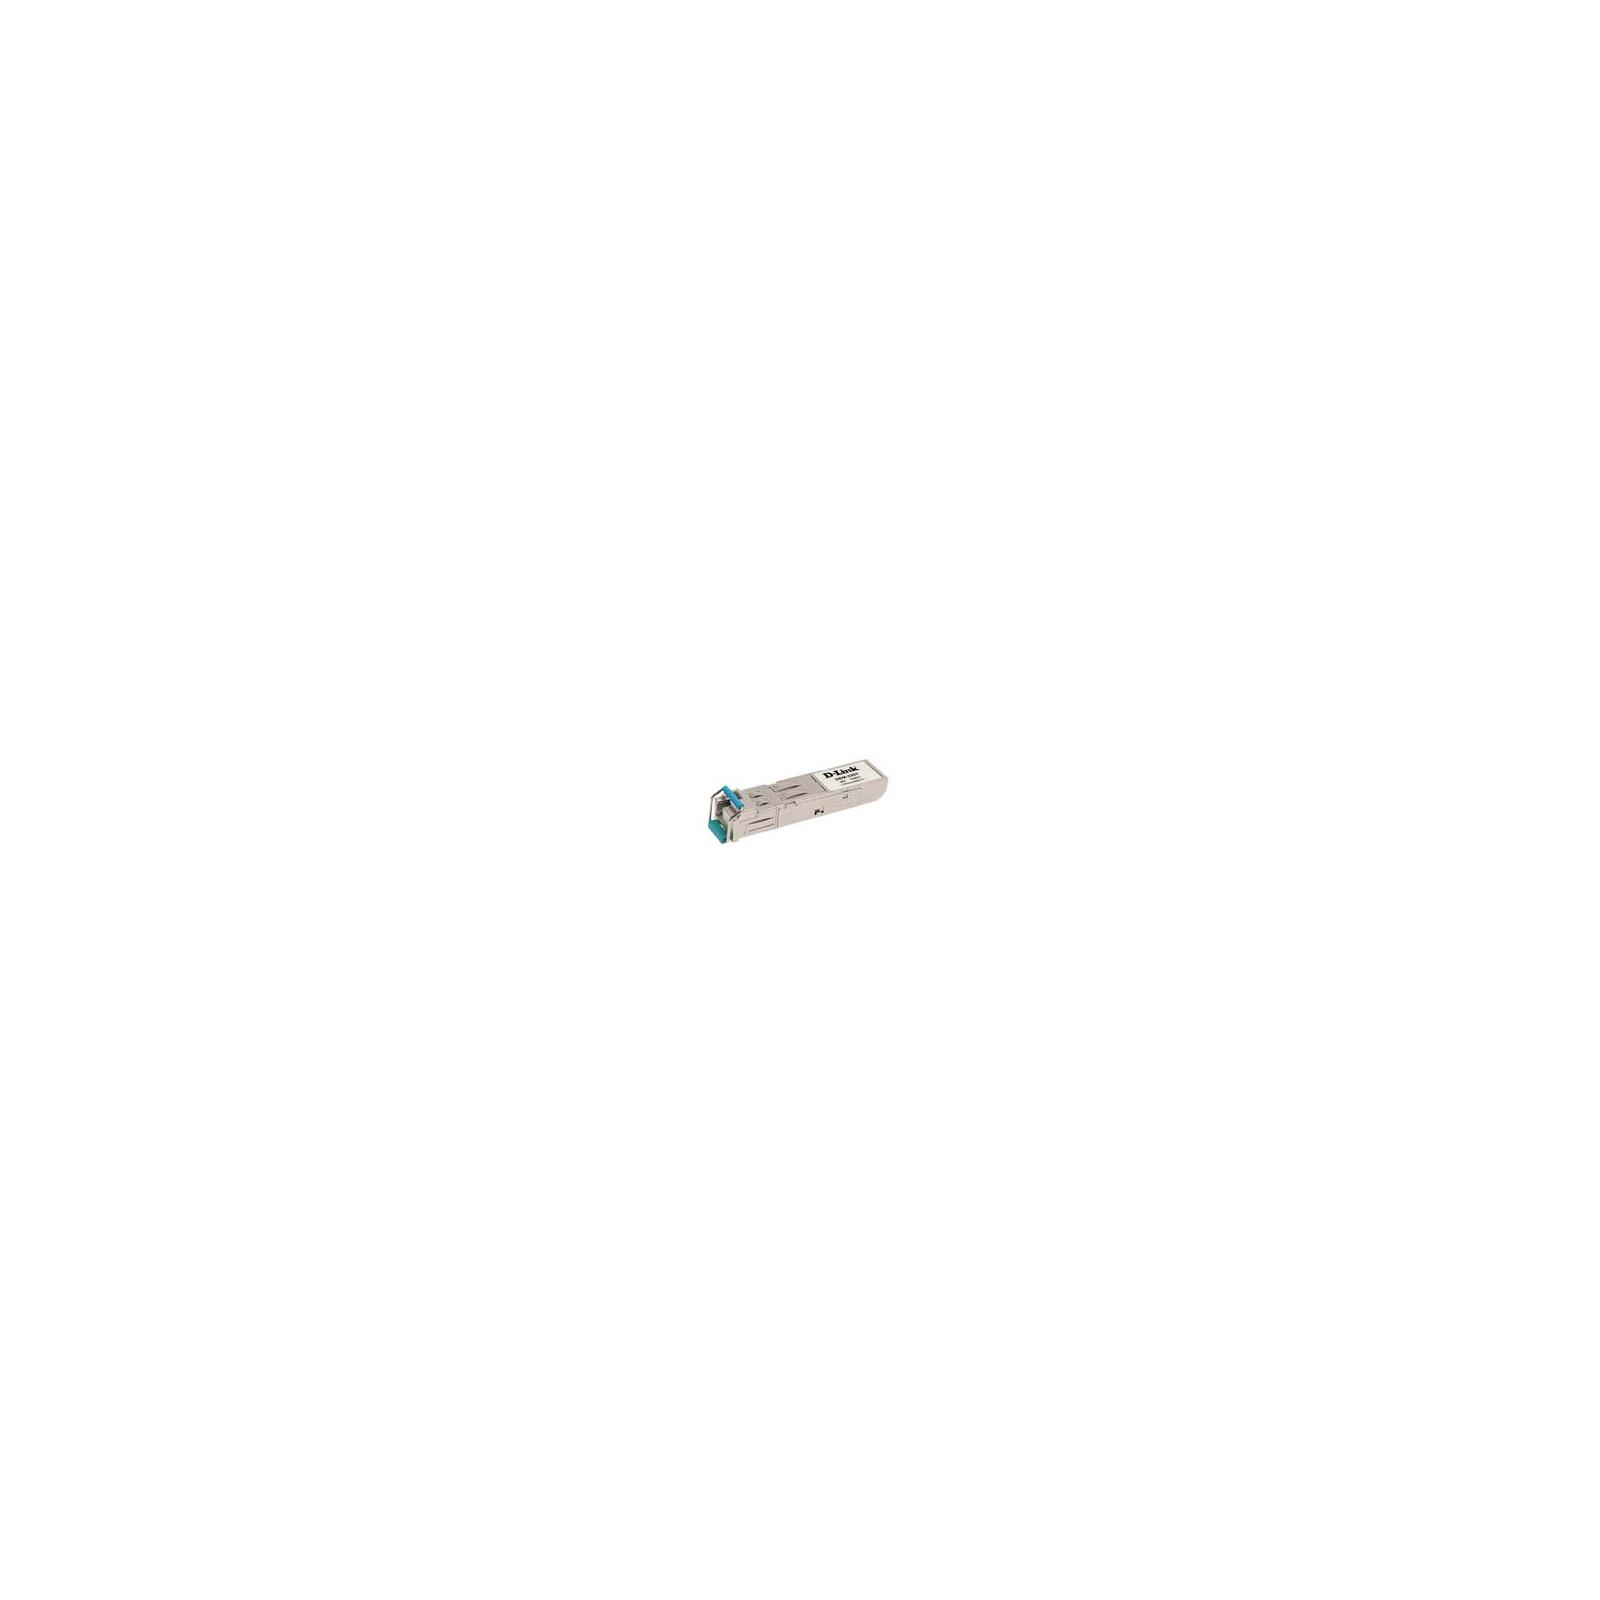 Модуль DEM-330R D-Link